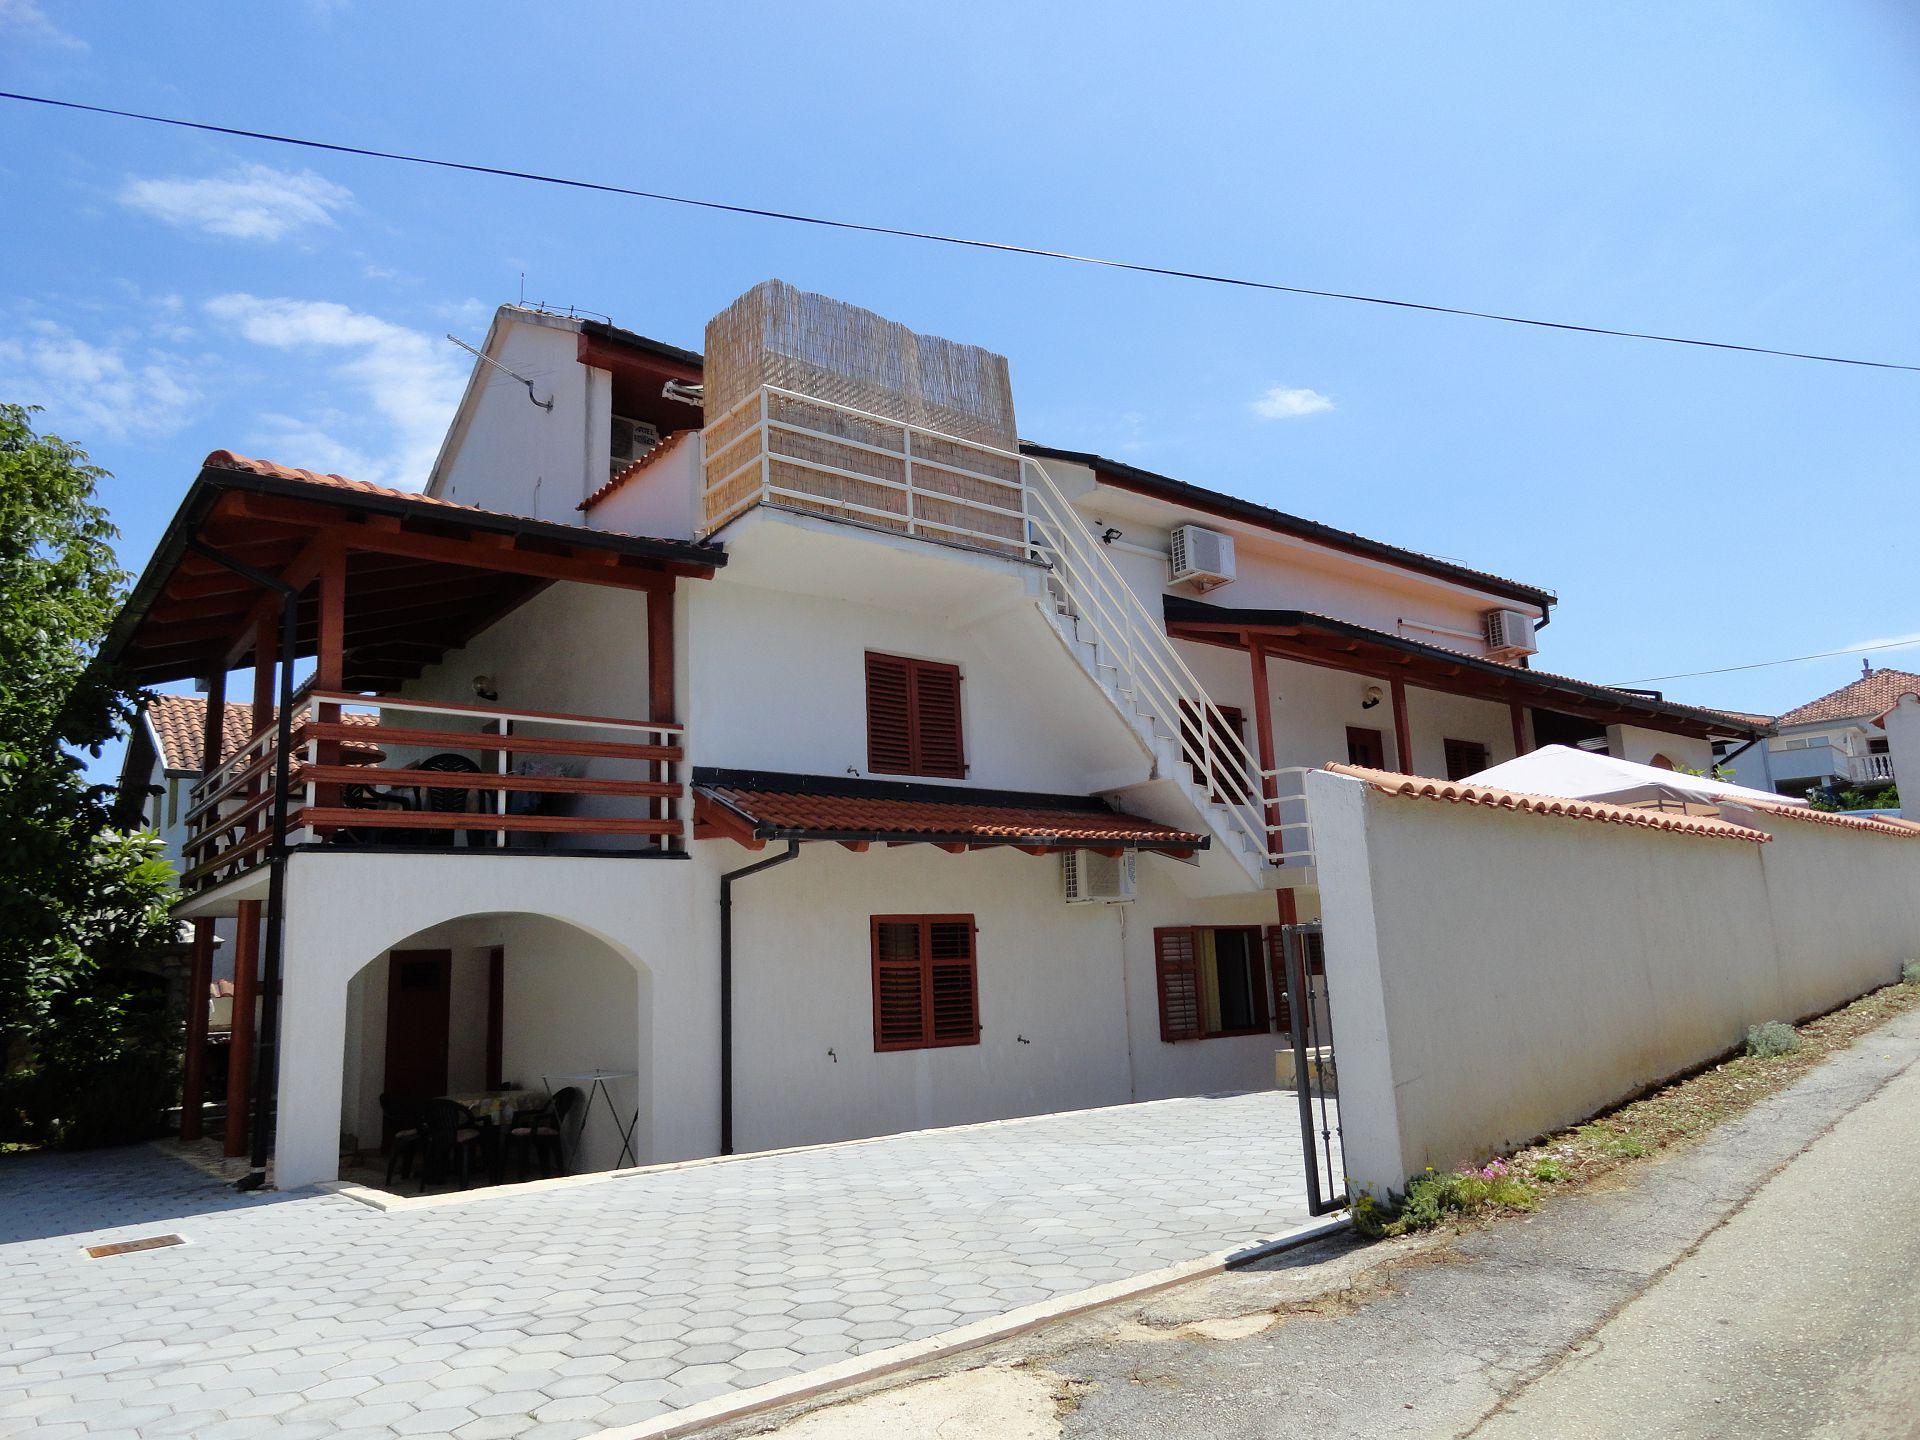 Apartamente Apartment Davor A2 Zdrelac, Island Pasman 53009, Zdrelac, Pašman, Zadarska